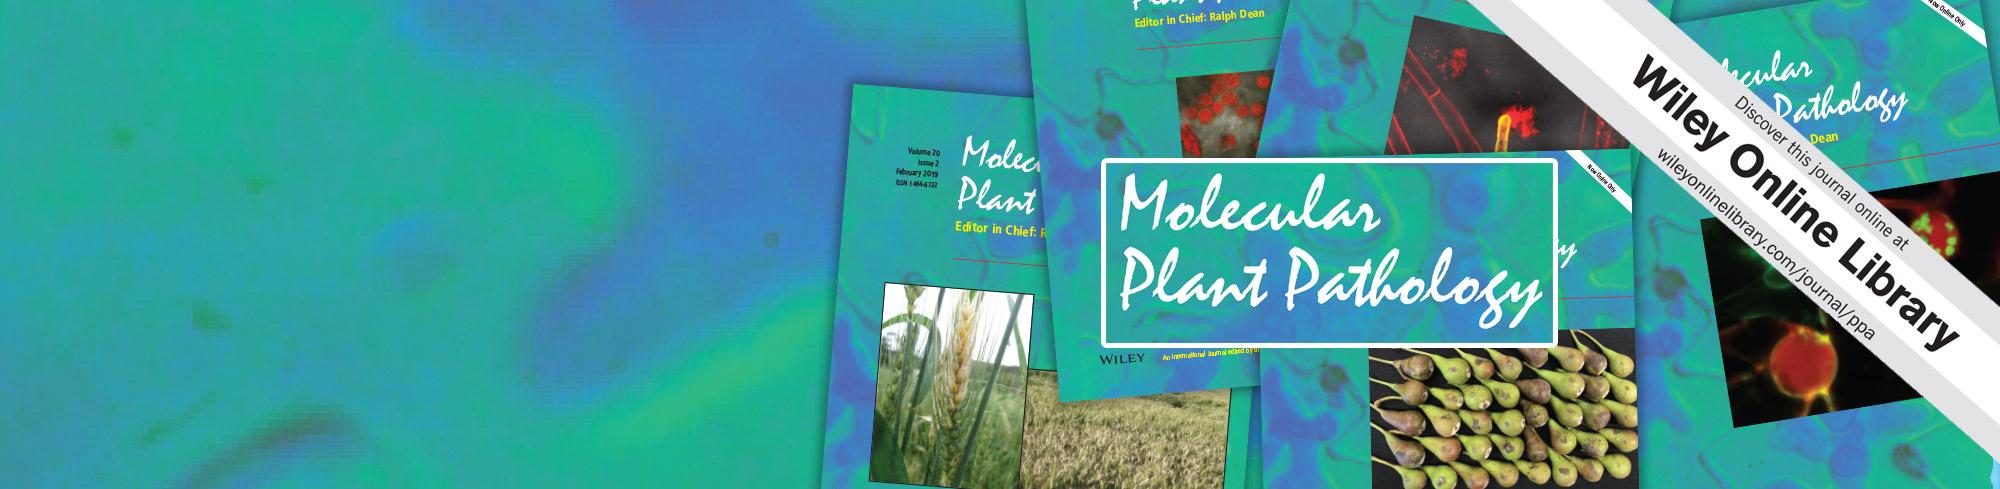 Molecular Plant Pathology – BSPP